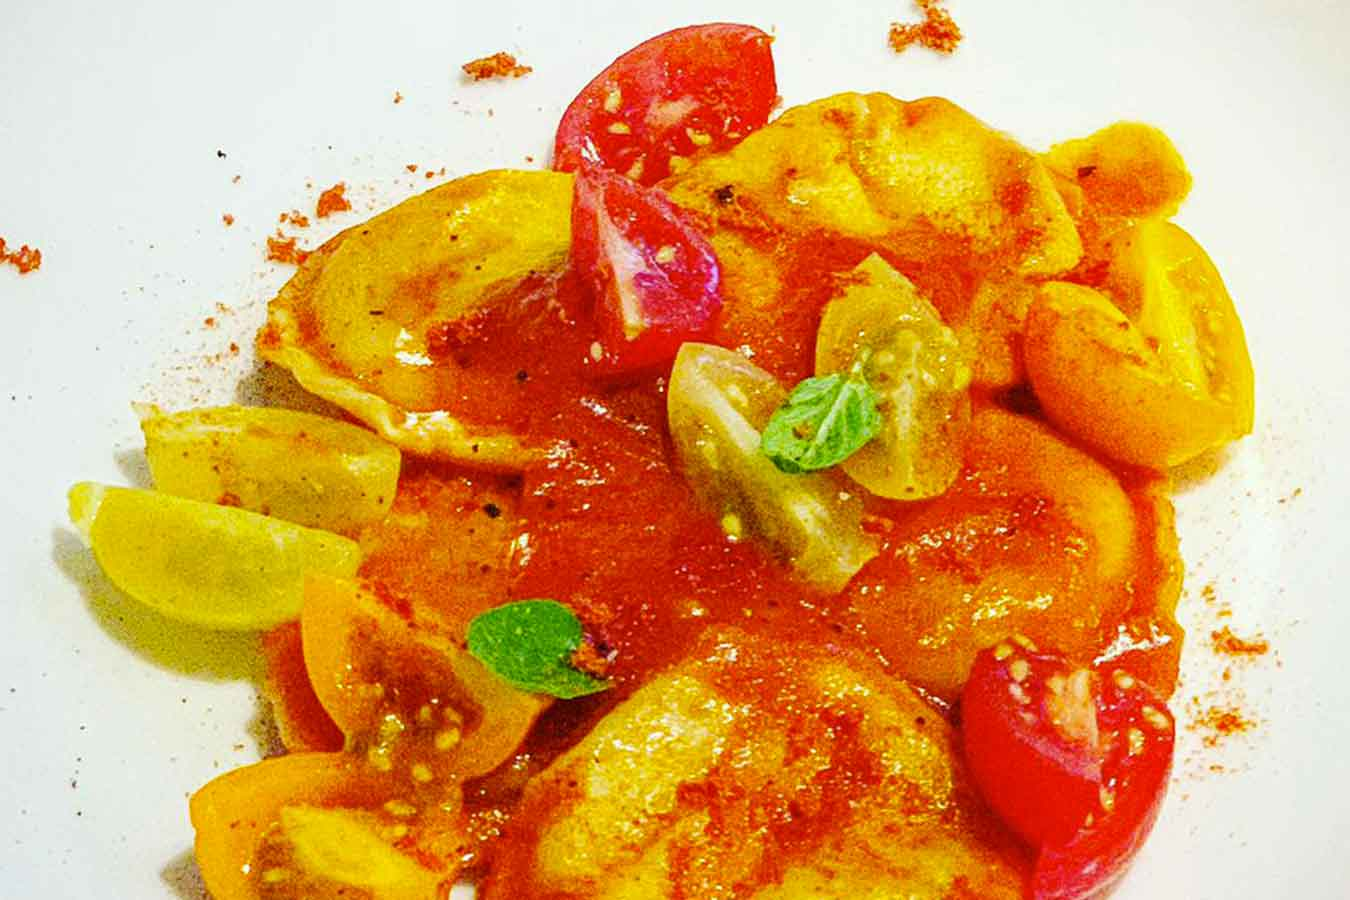 Ravioli patate, pecorino, menta e pomodoro